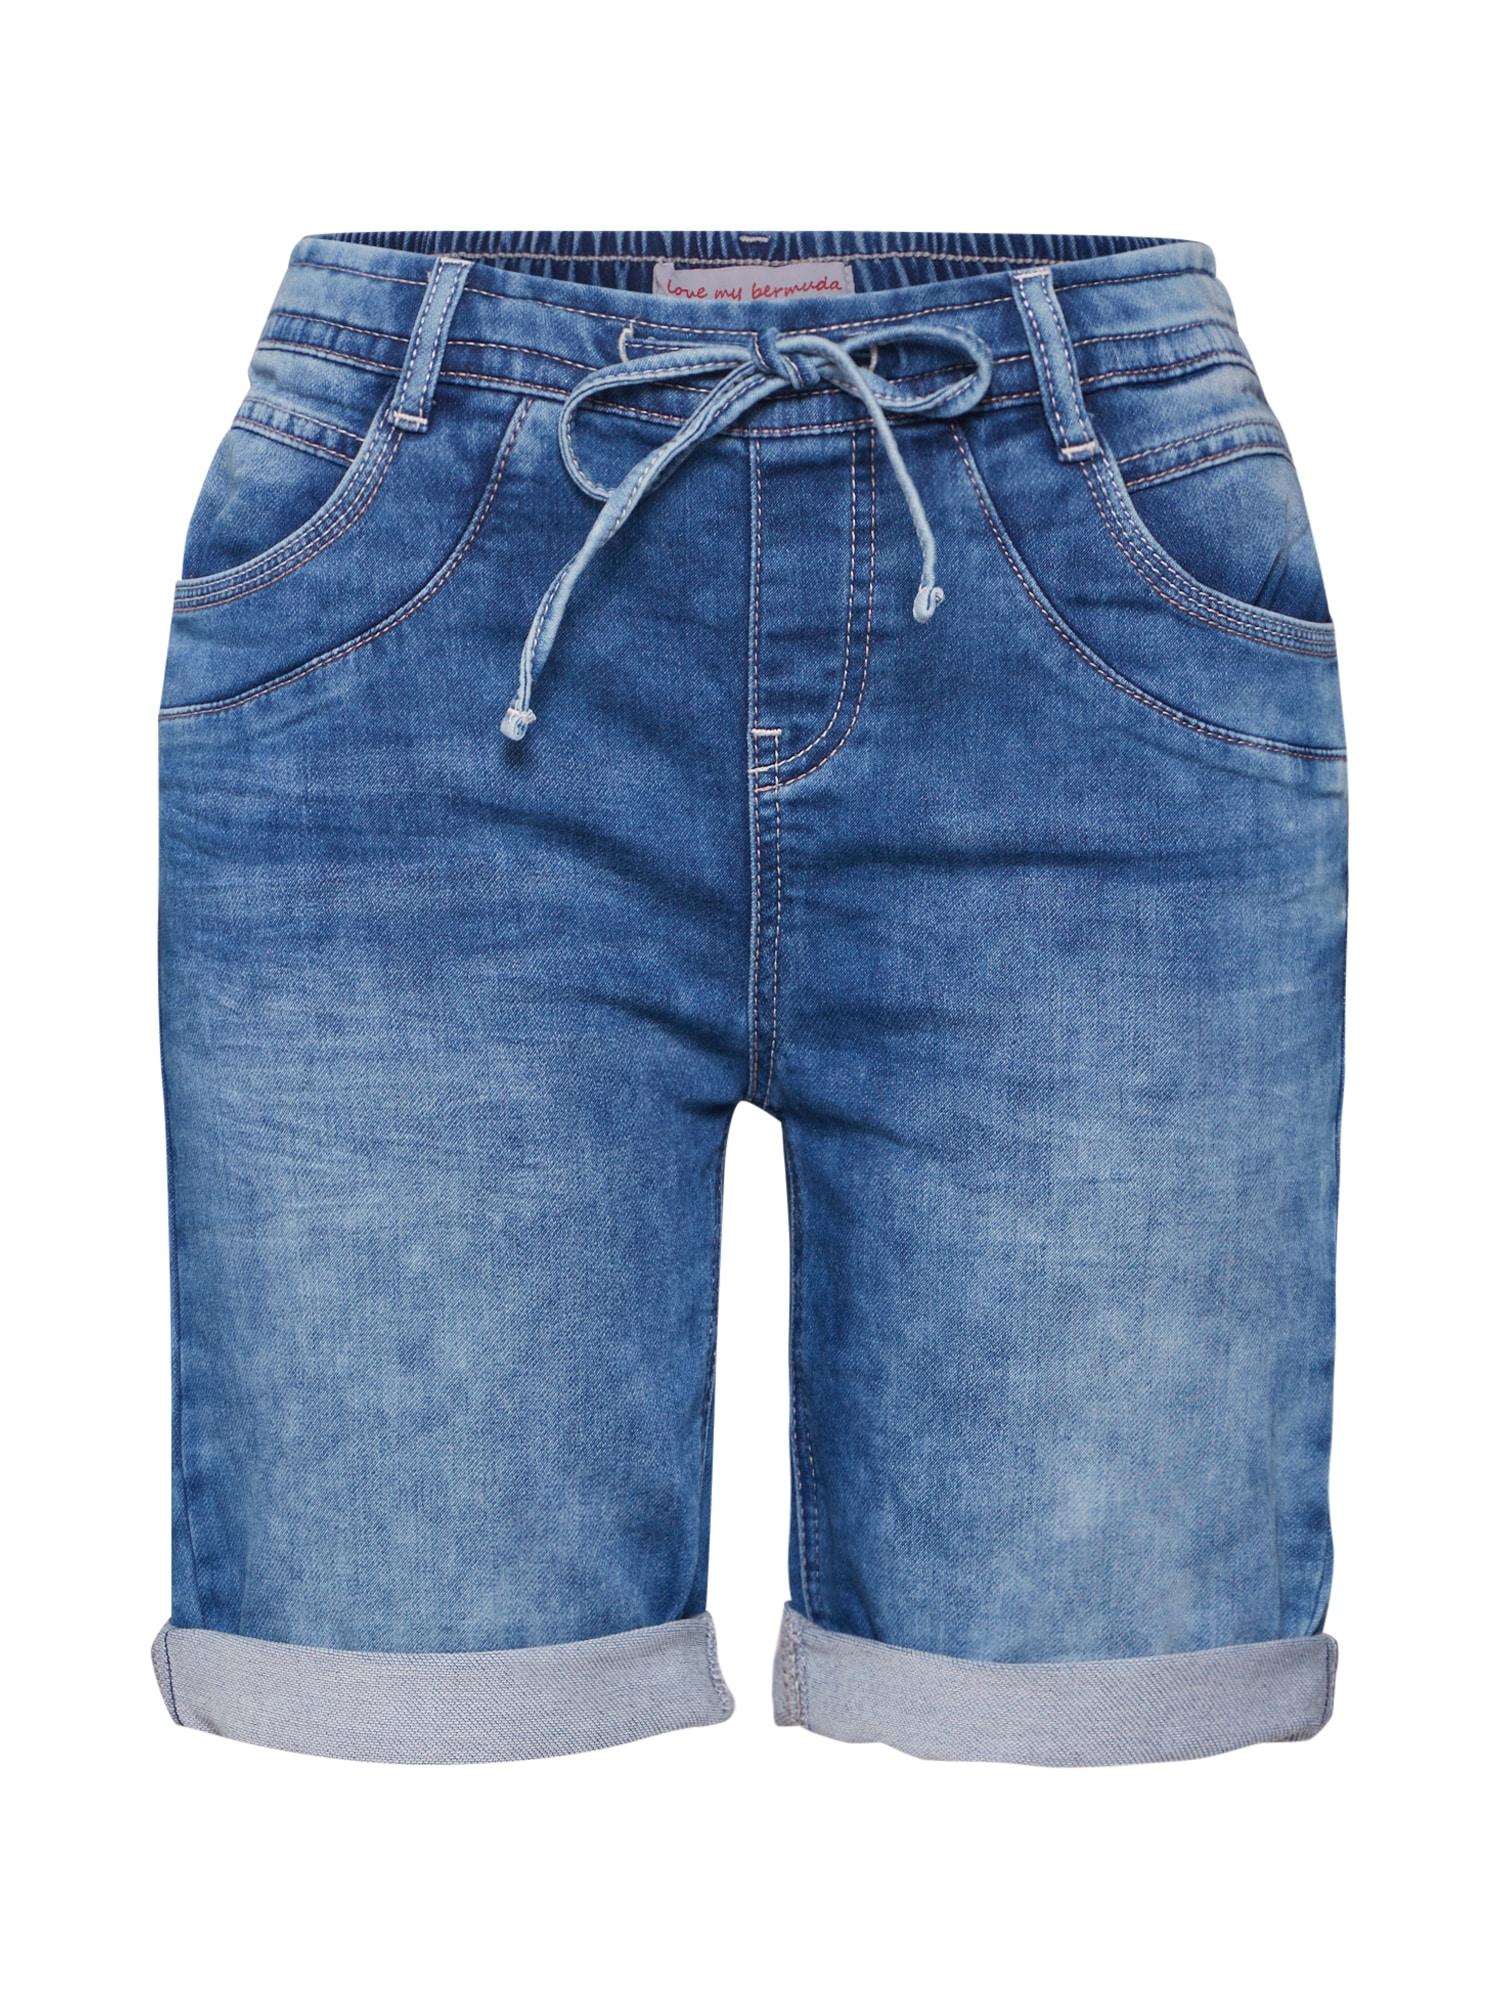 Bermuda 'Bonny' | Bekleidung > Jeans > Shorts & Bermudas | STREET ONE